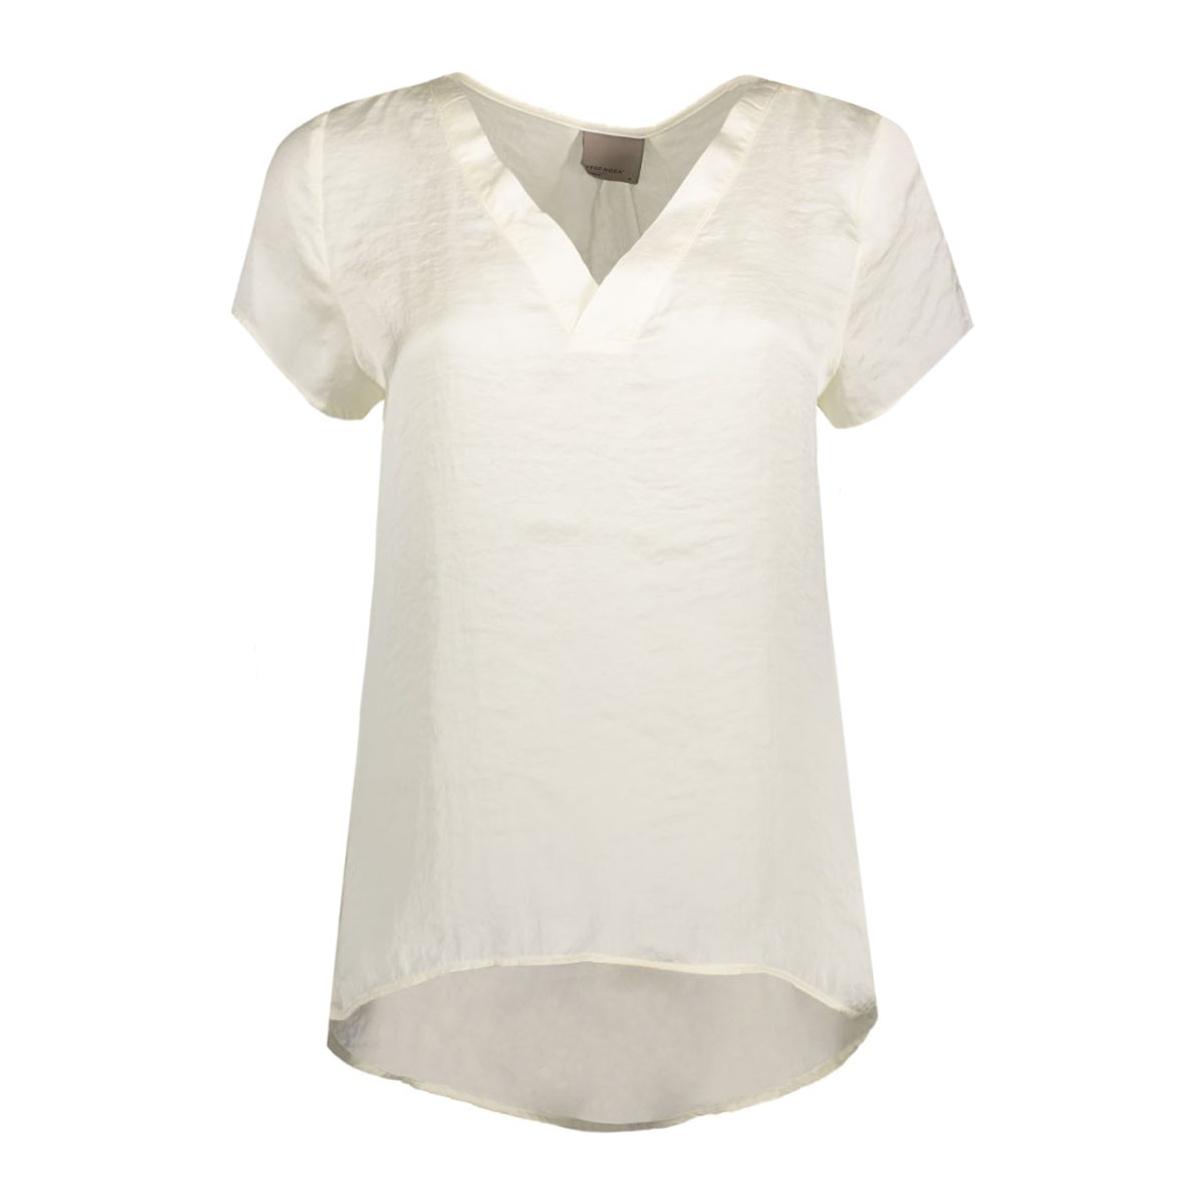 vmhammer cap sleeve midi top a 10165228 vero moda t-shirt snow white